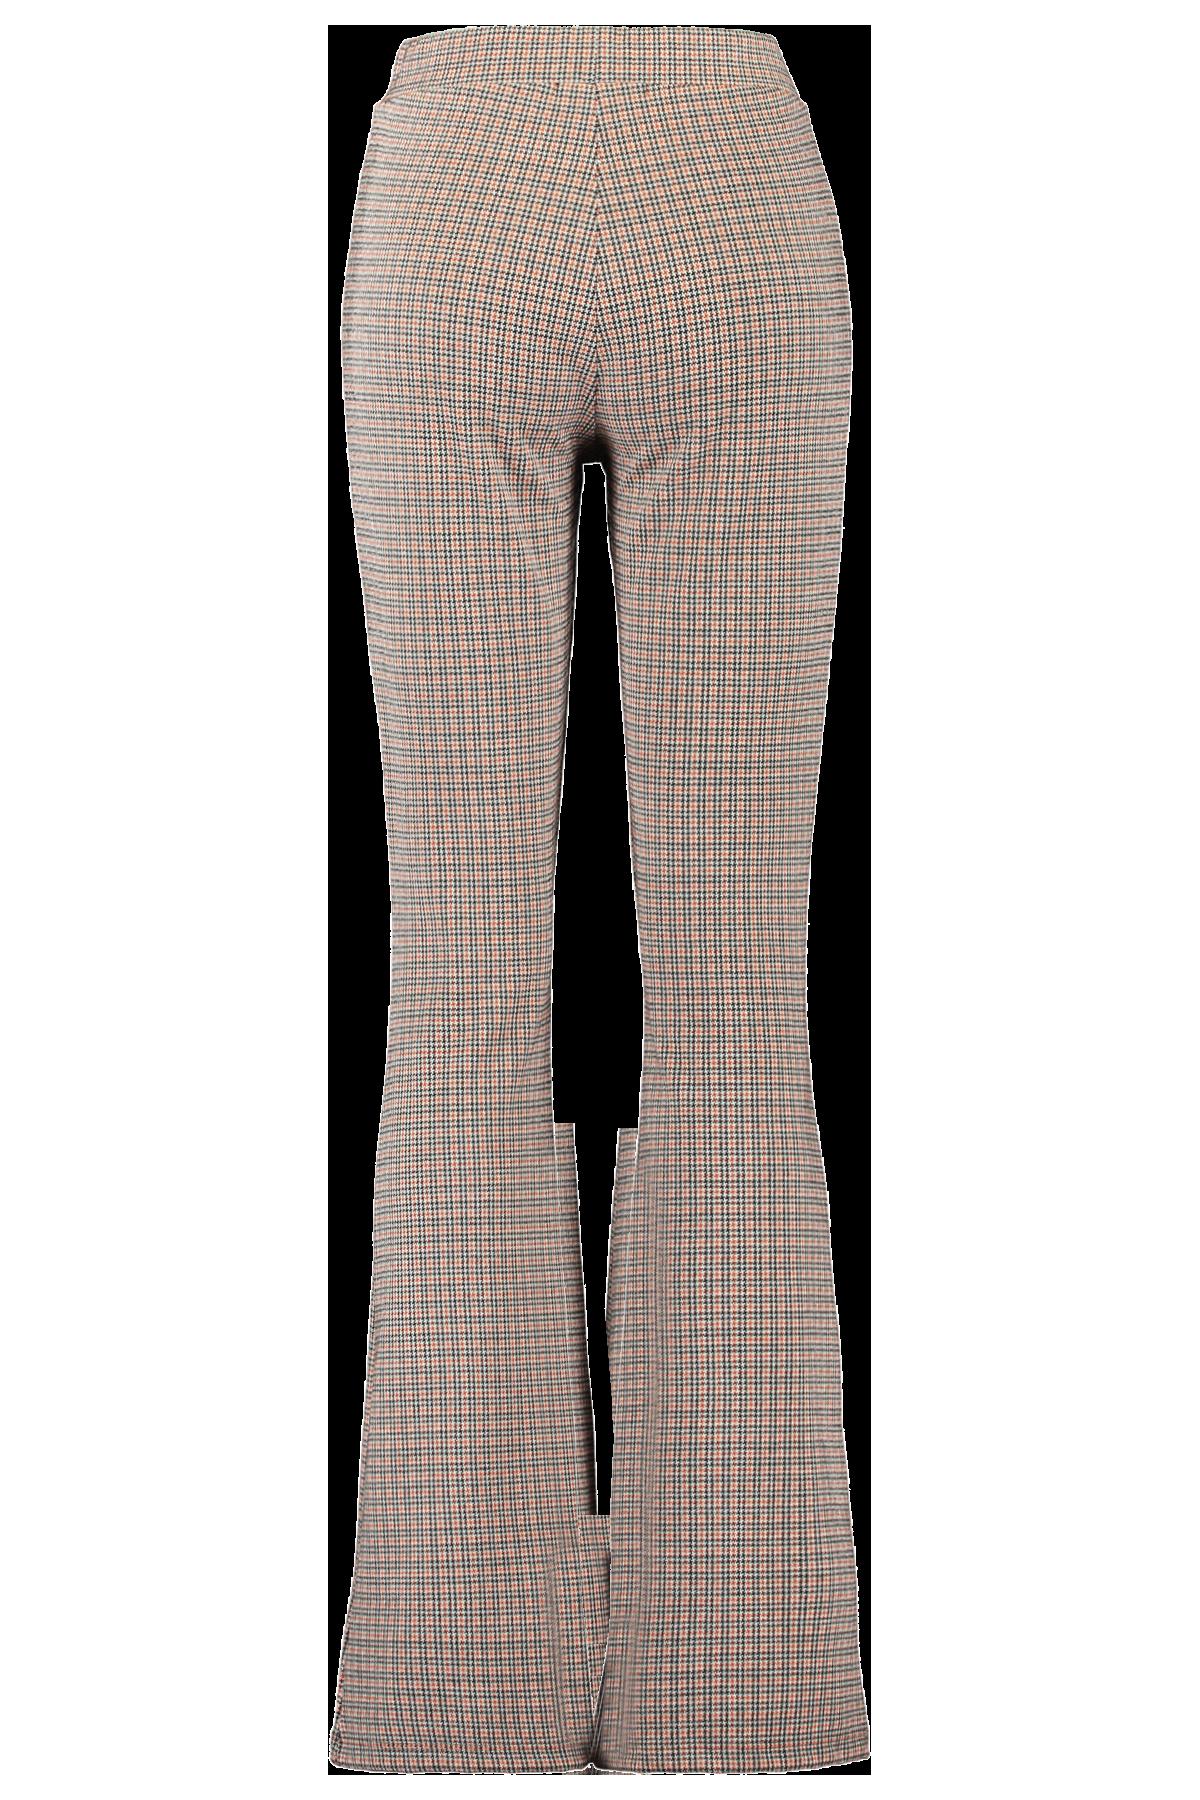 Legging Charly Shorty Lilac check